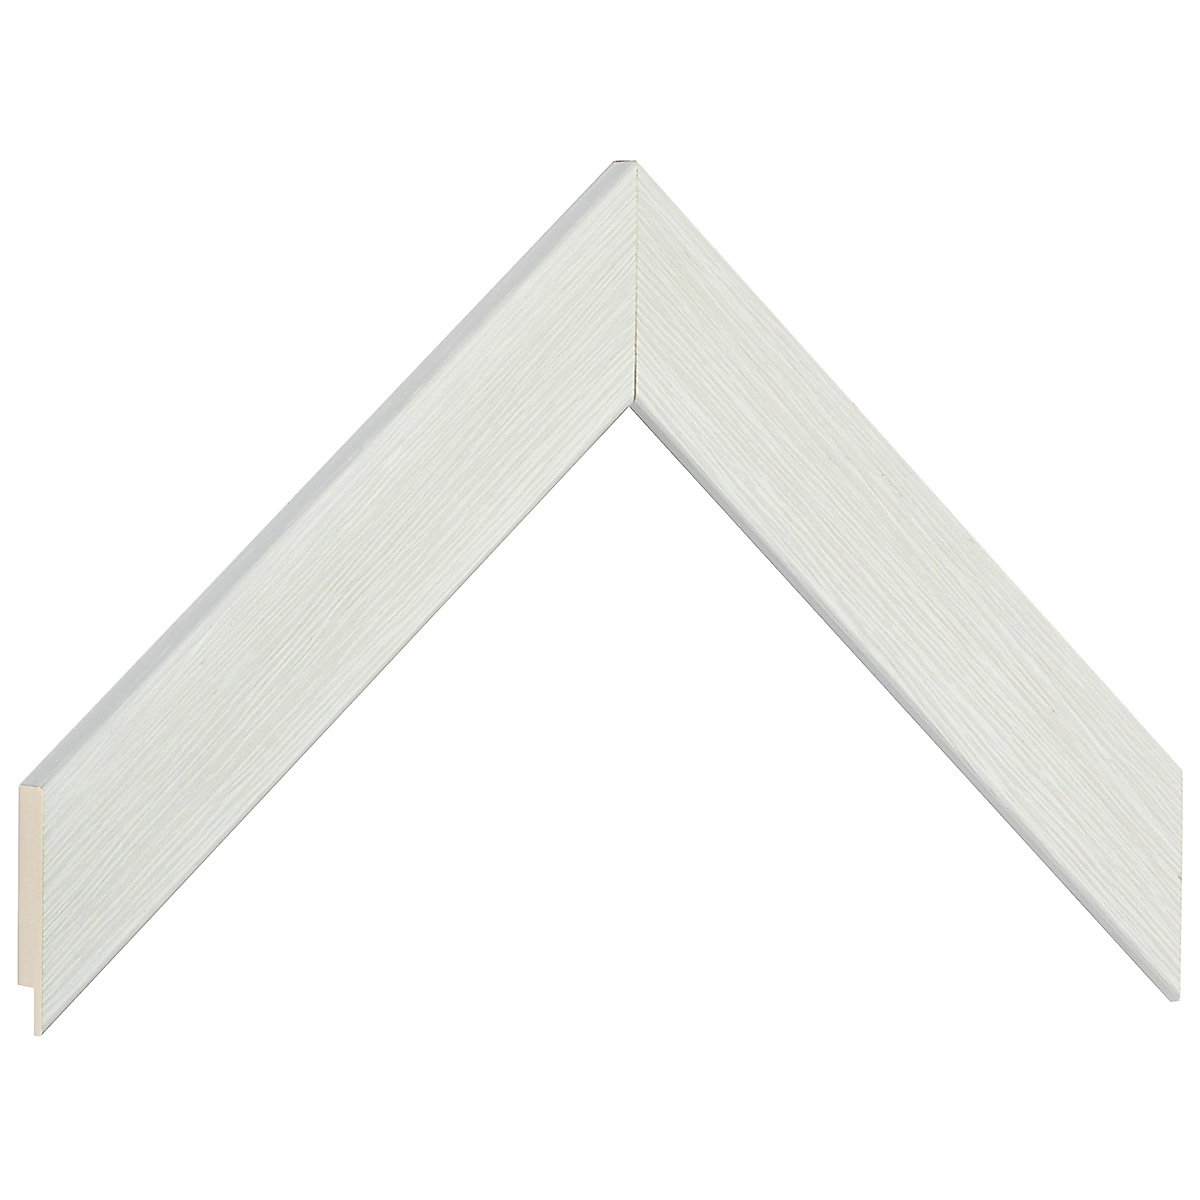 Moulding ayous, width 30mm height 14 - white, open grain